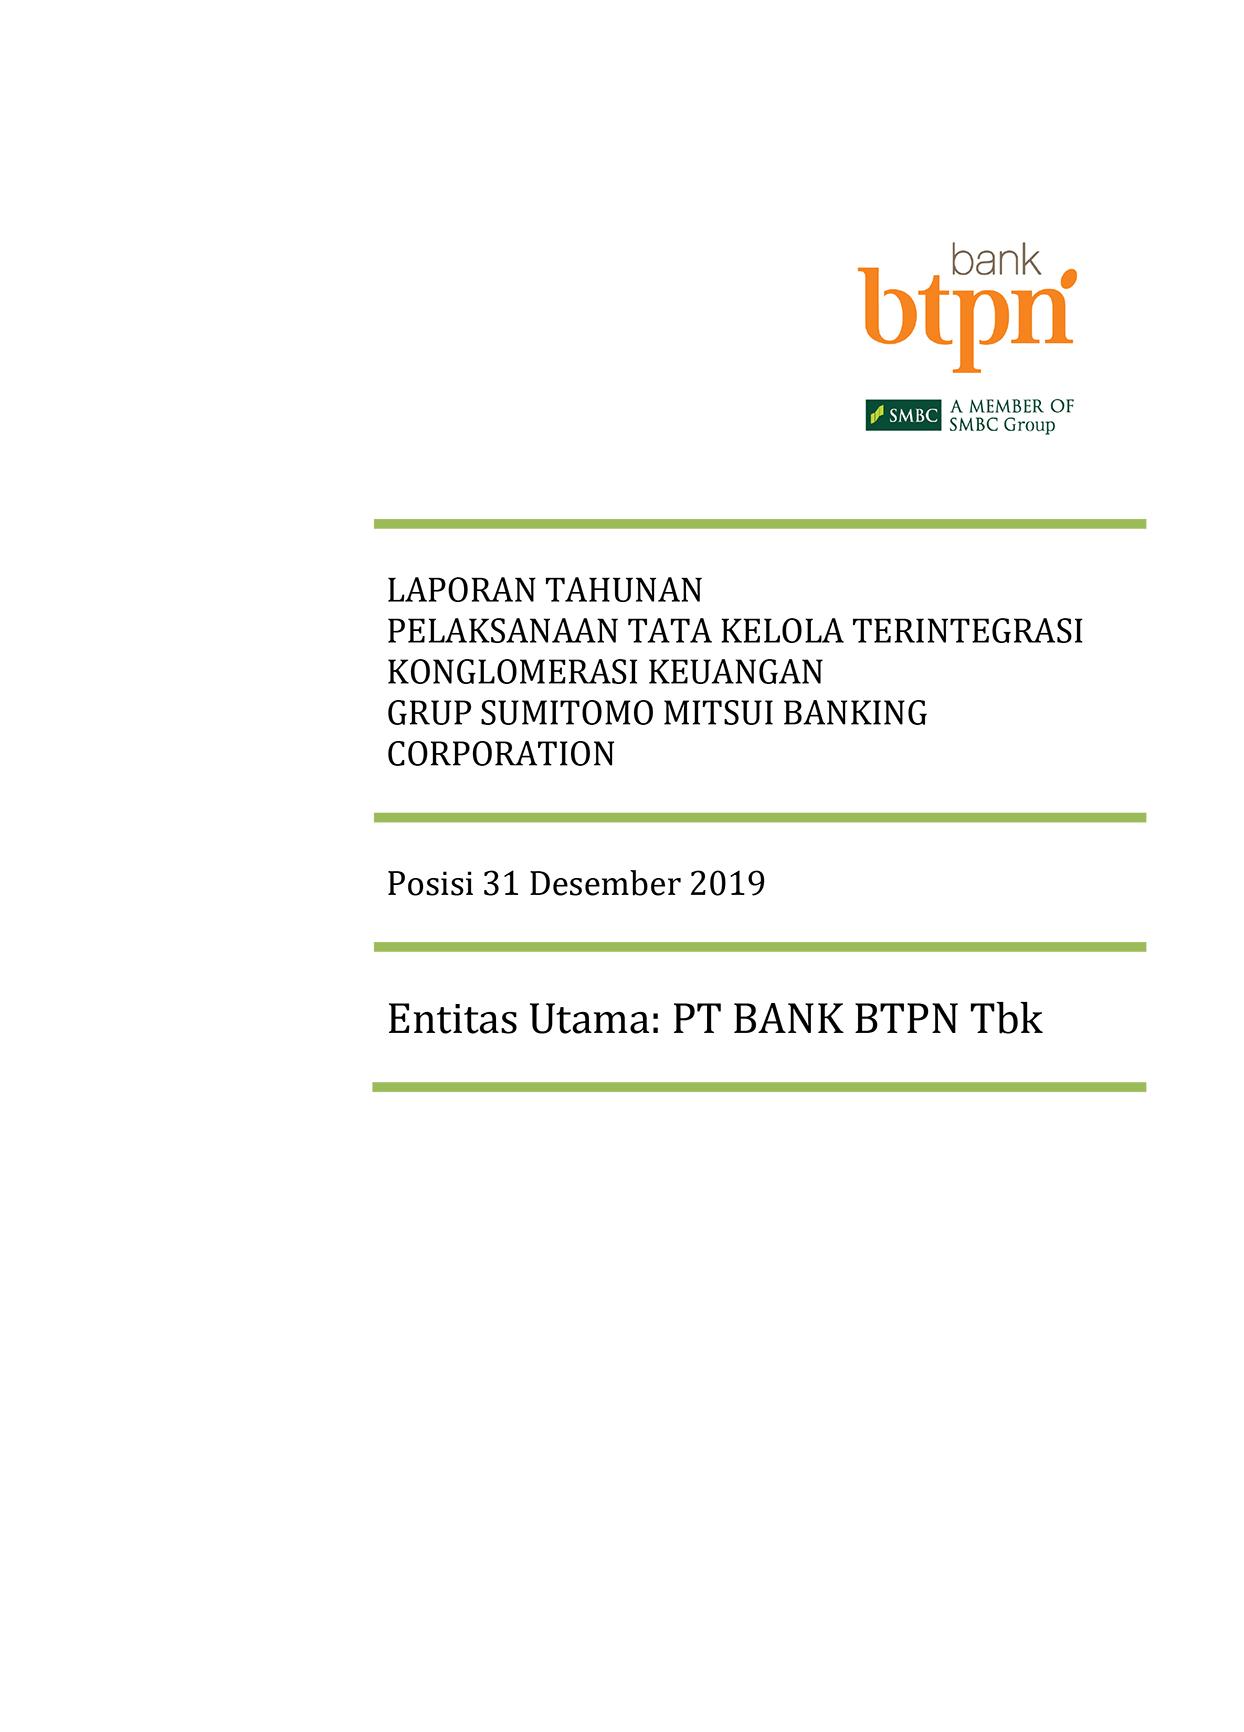 Laporan Tahunan Pelaksanaan Tata Kelola Terintegrasi Konglomerasi Keuangan